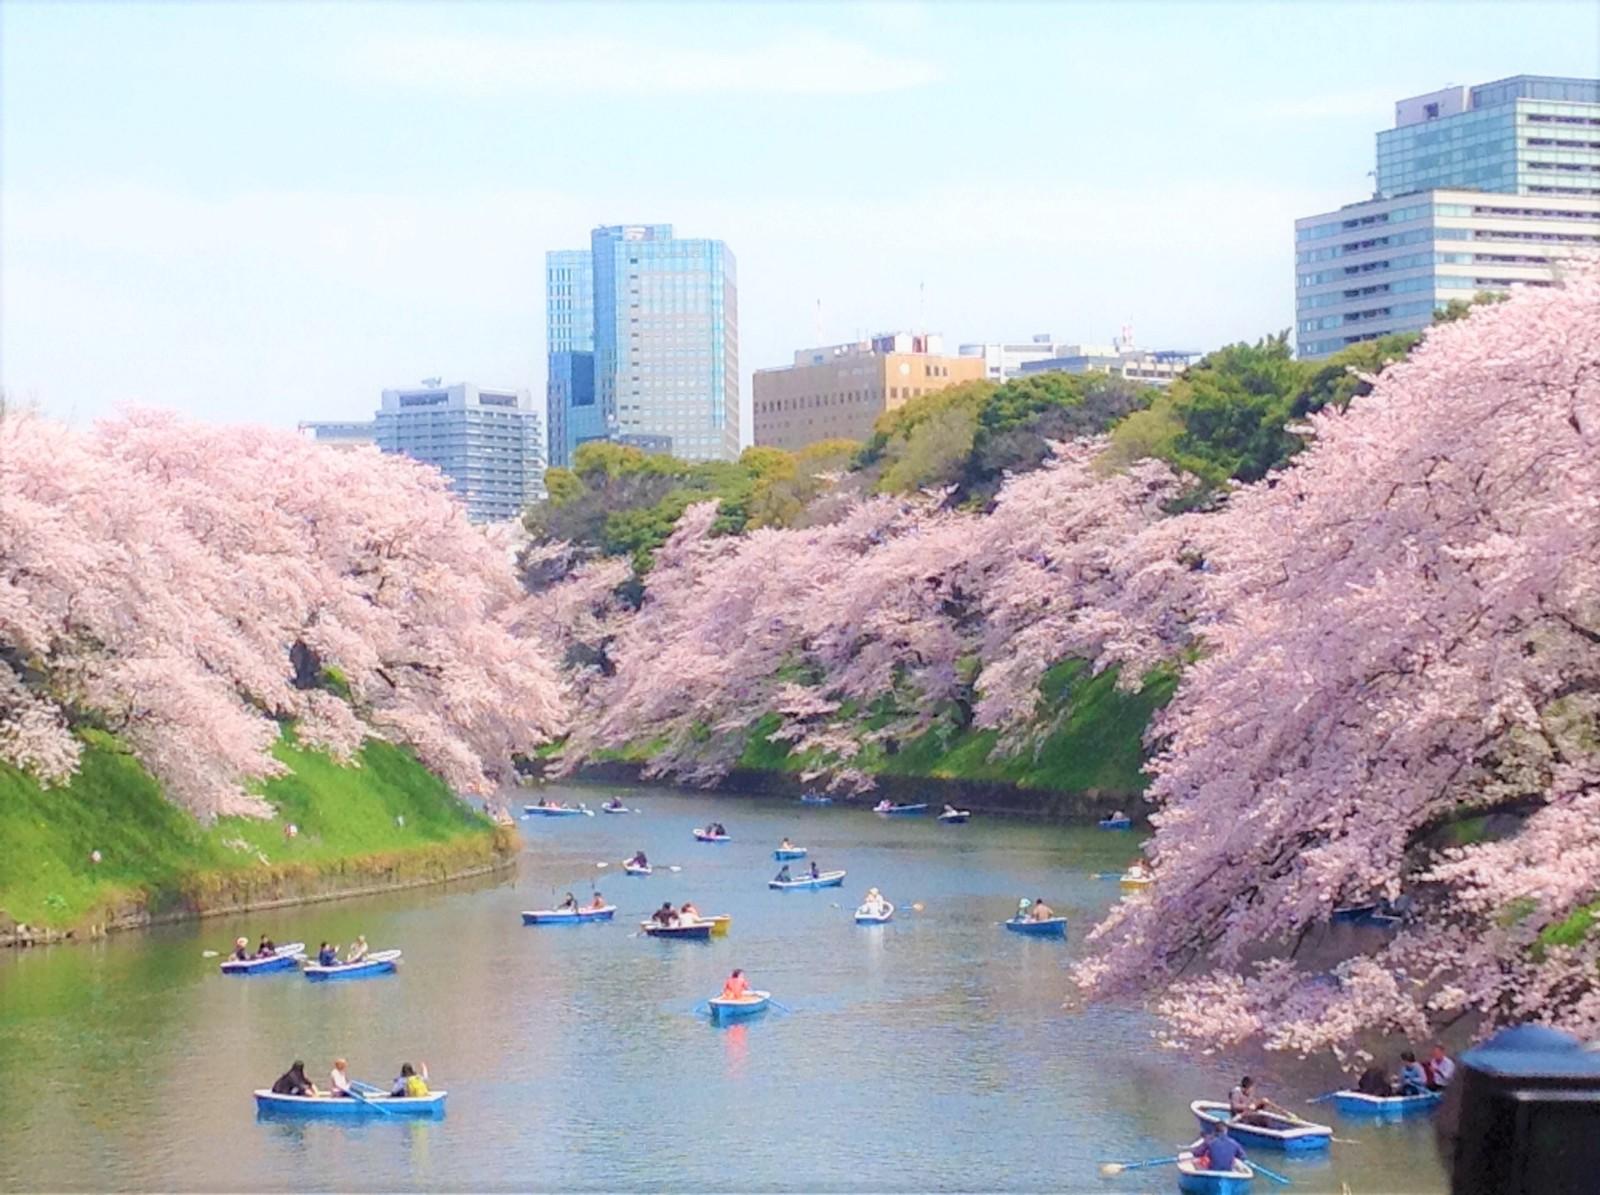 Cherry blossoms, Chidorigafuchi